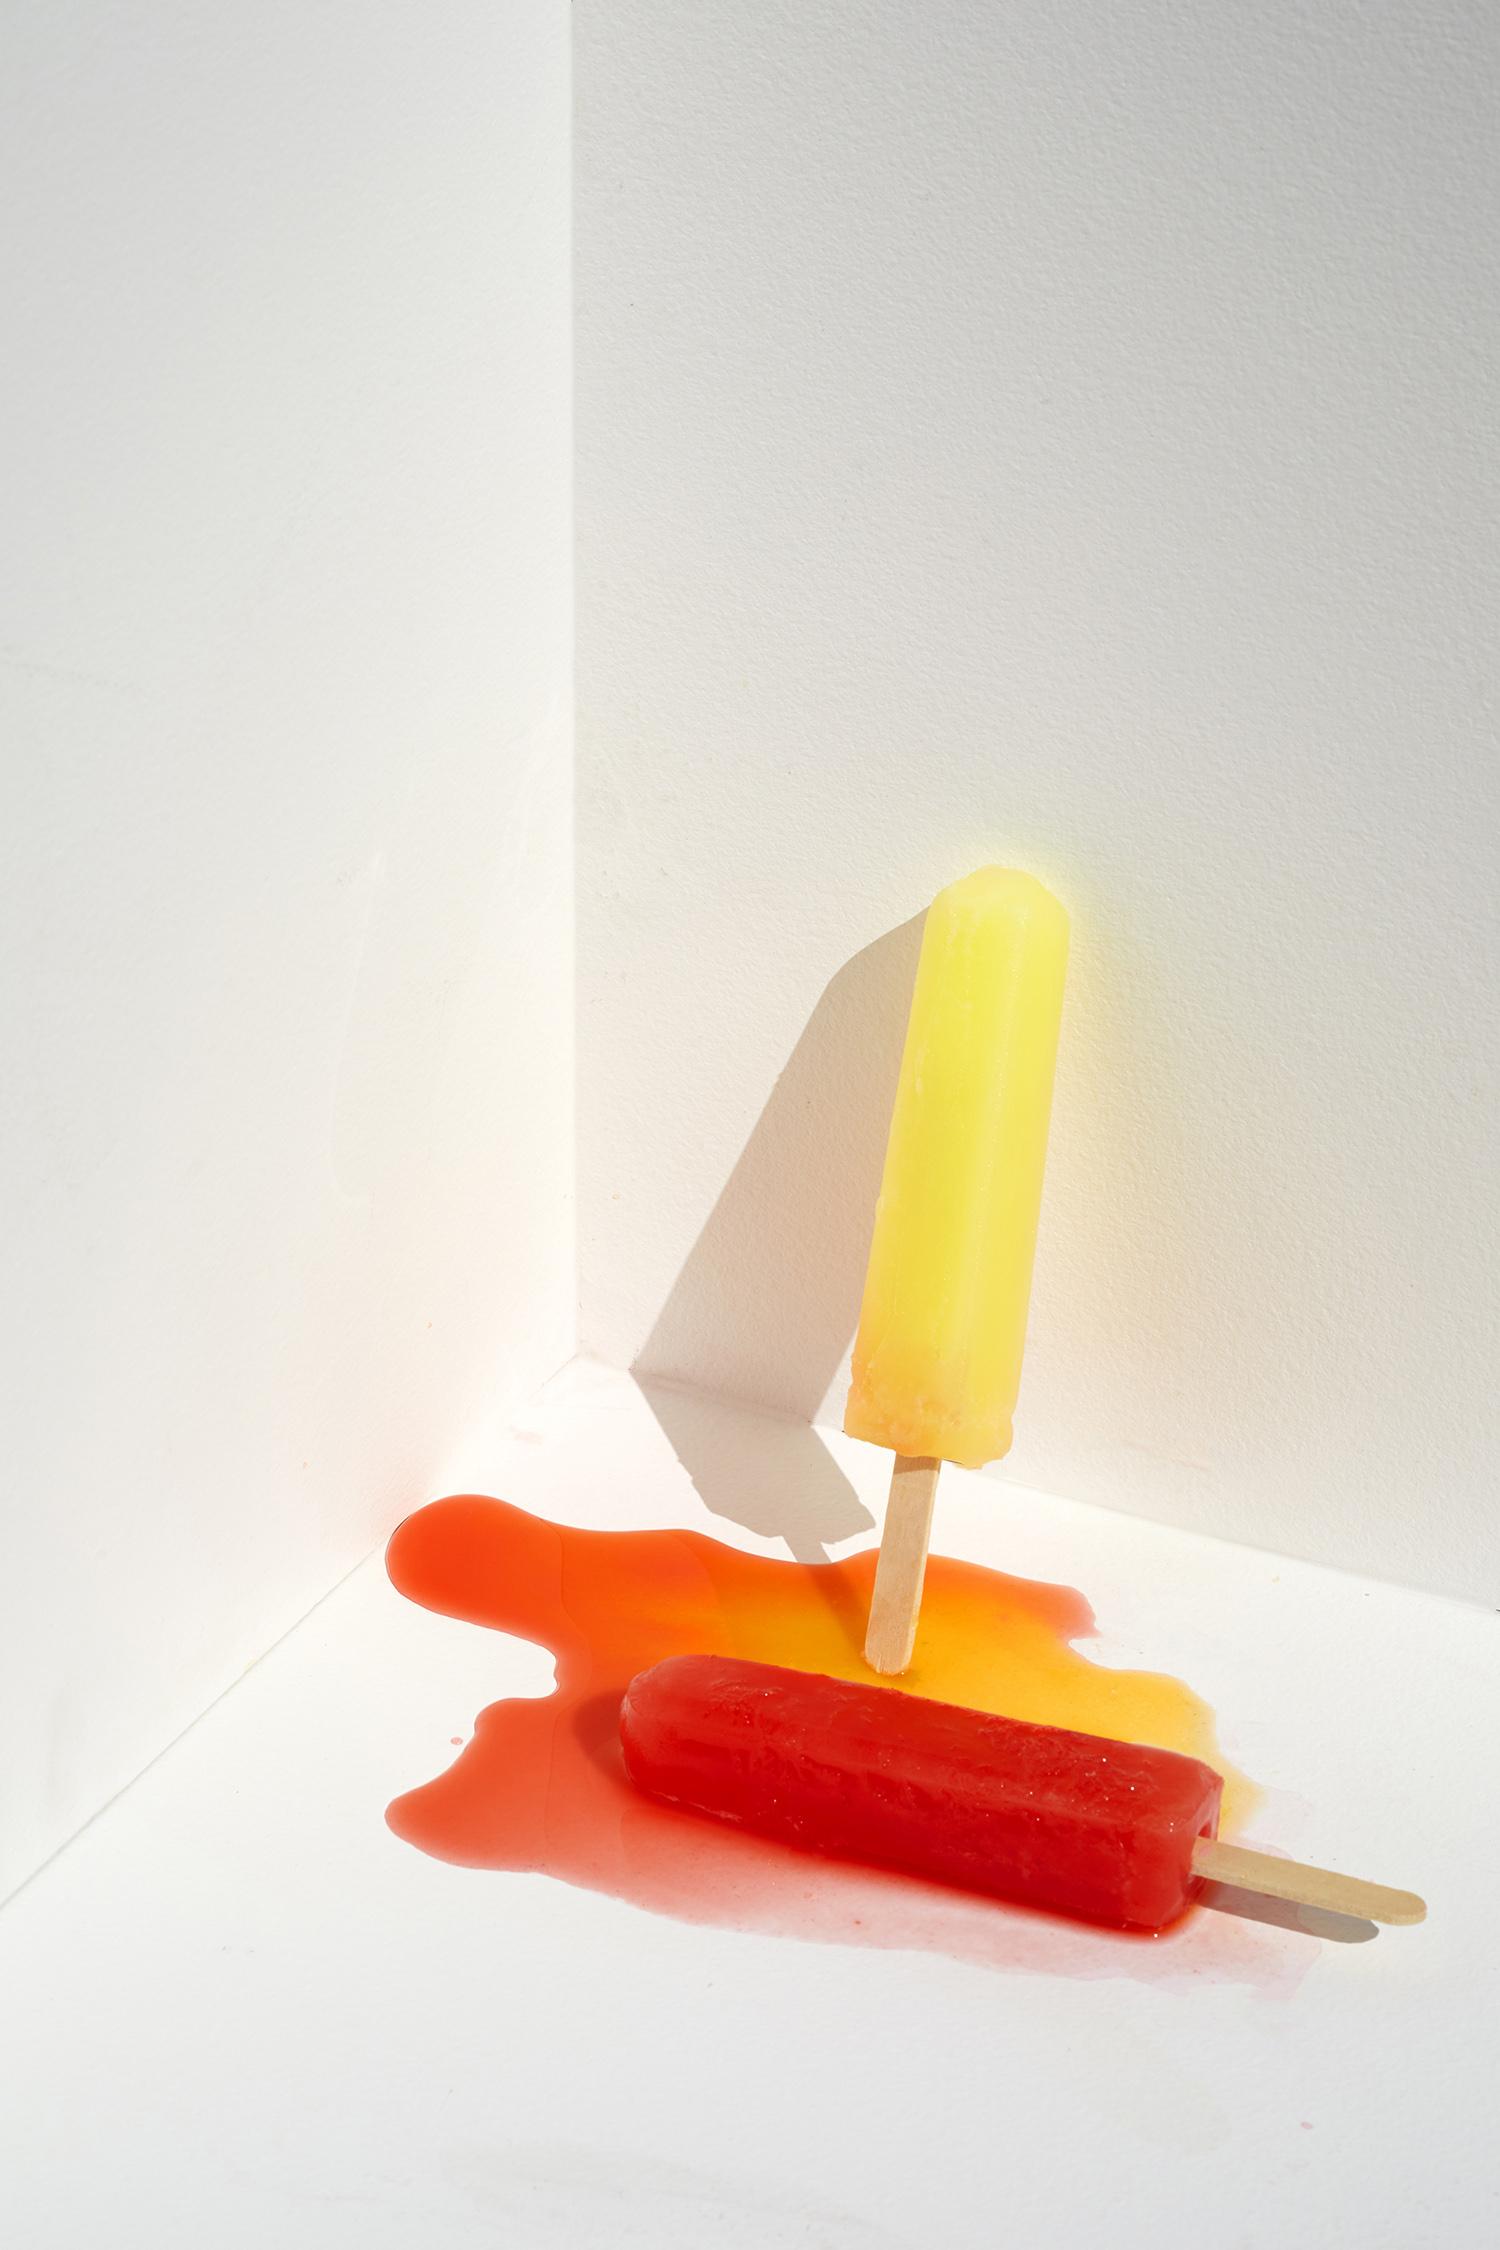 melting-popsicle-1